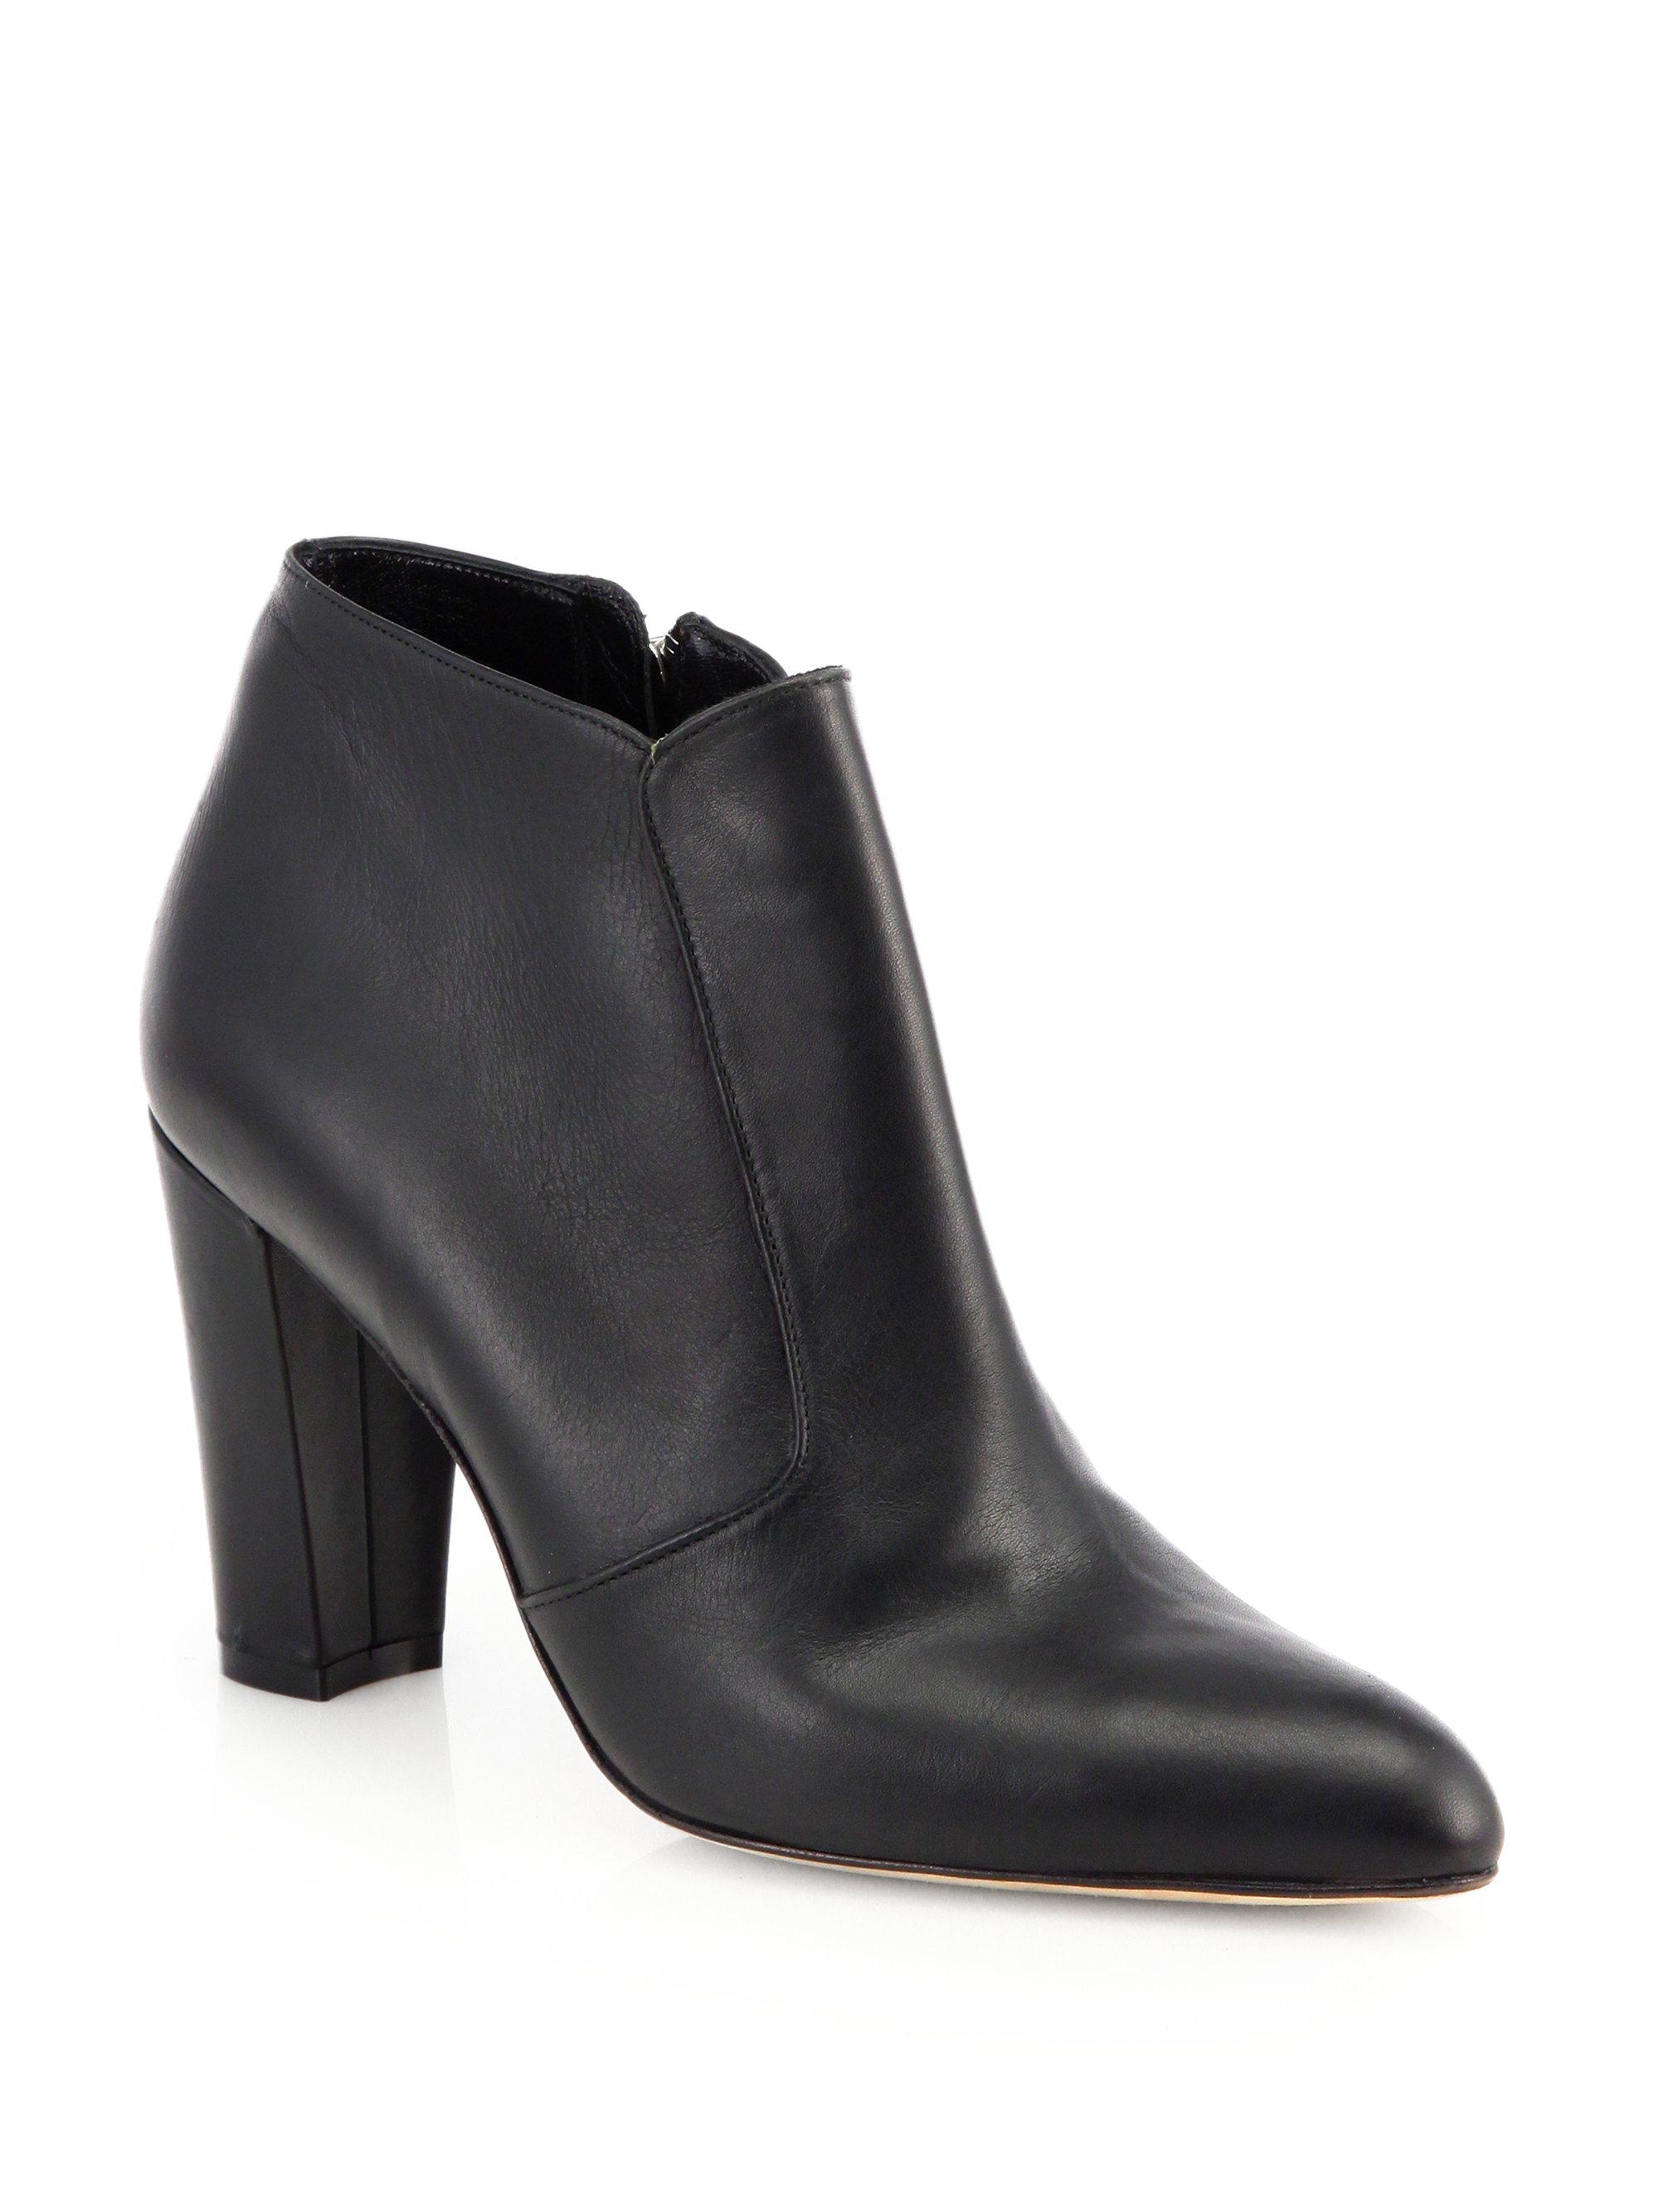 Manolo Blahnik Zavattplao Leather Ankle Boots in Black   Lyst